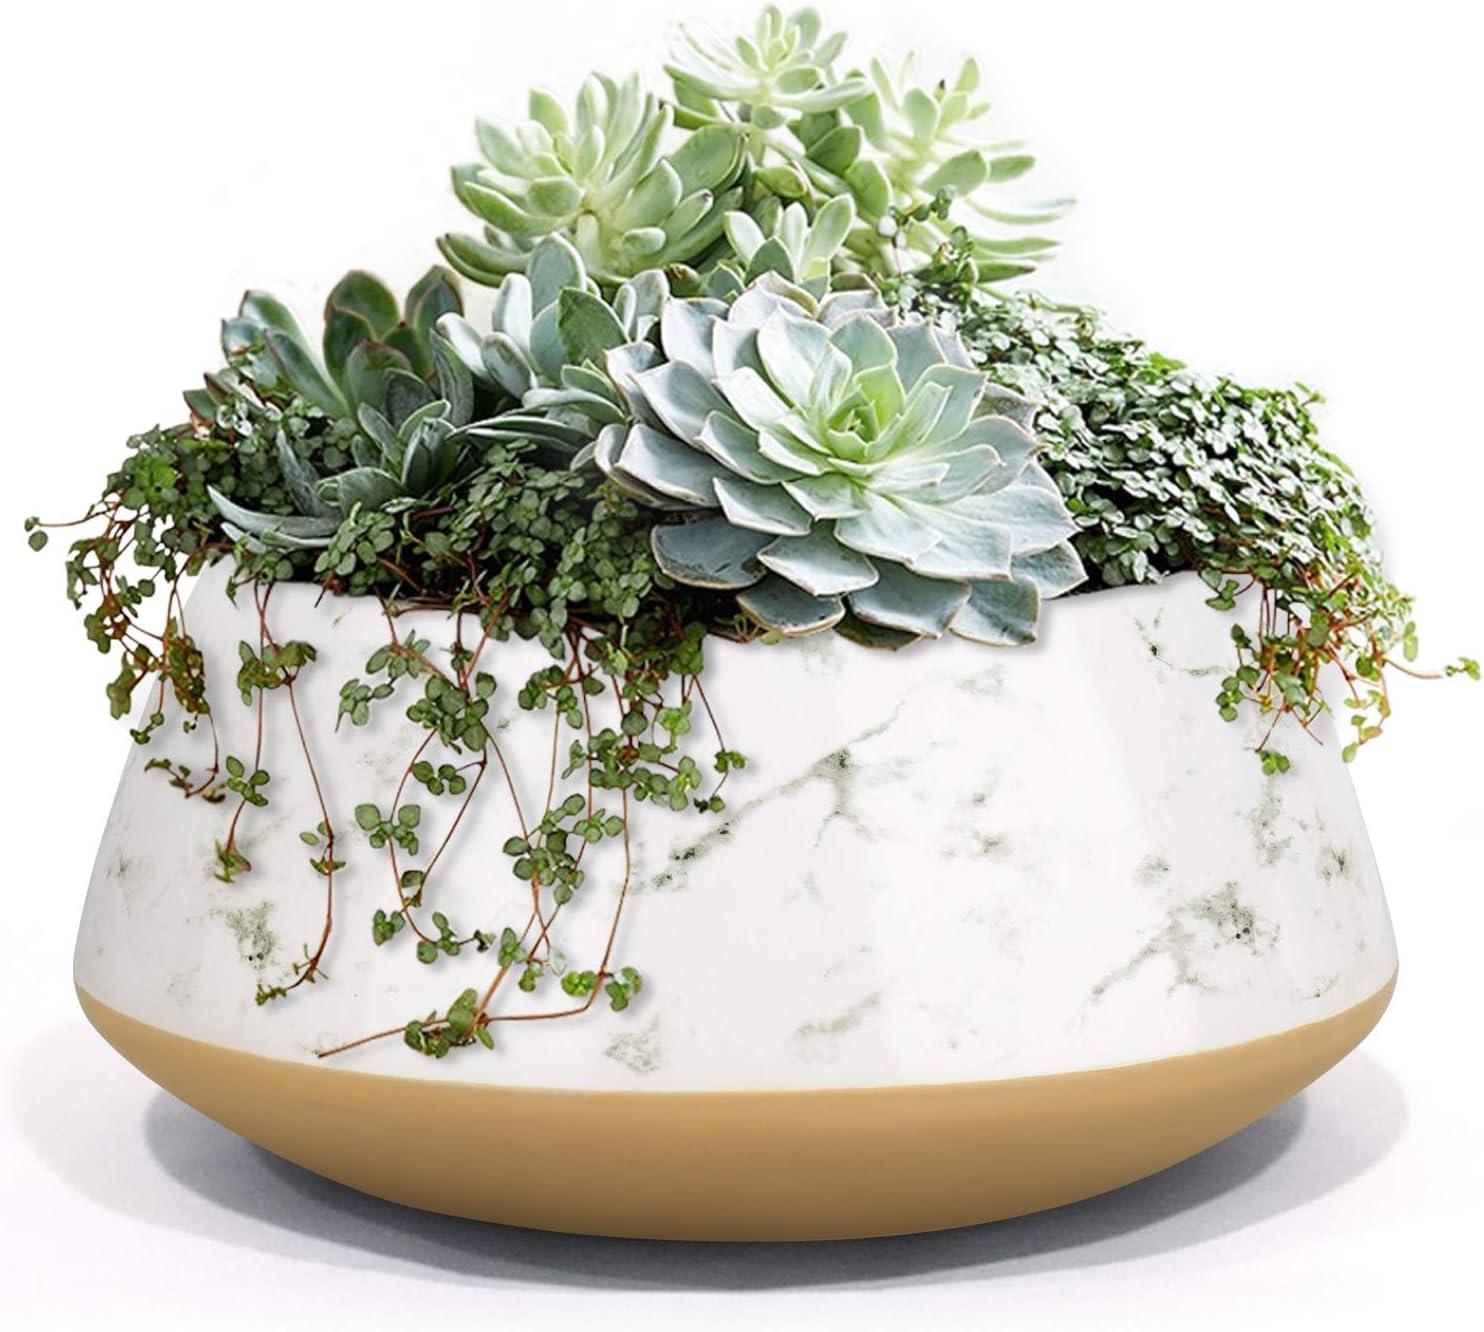 LA JOLIE MUSE Large Succulent Planter Plant Pots, Ceramic Indoor Outdoor Garden Pot with Drainage for Plant Flower, 8 Inch, Splash Ink & Sandy Beige